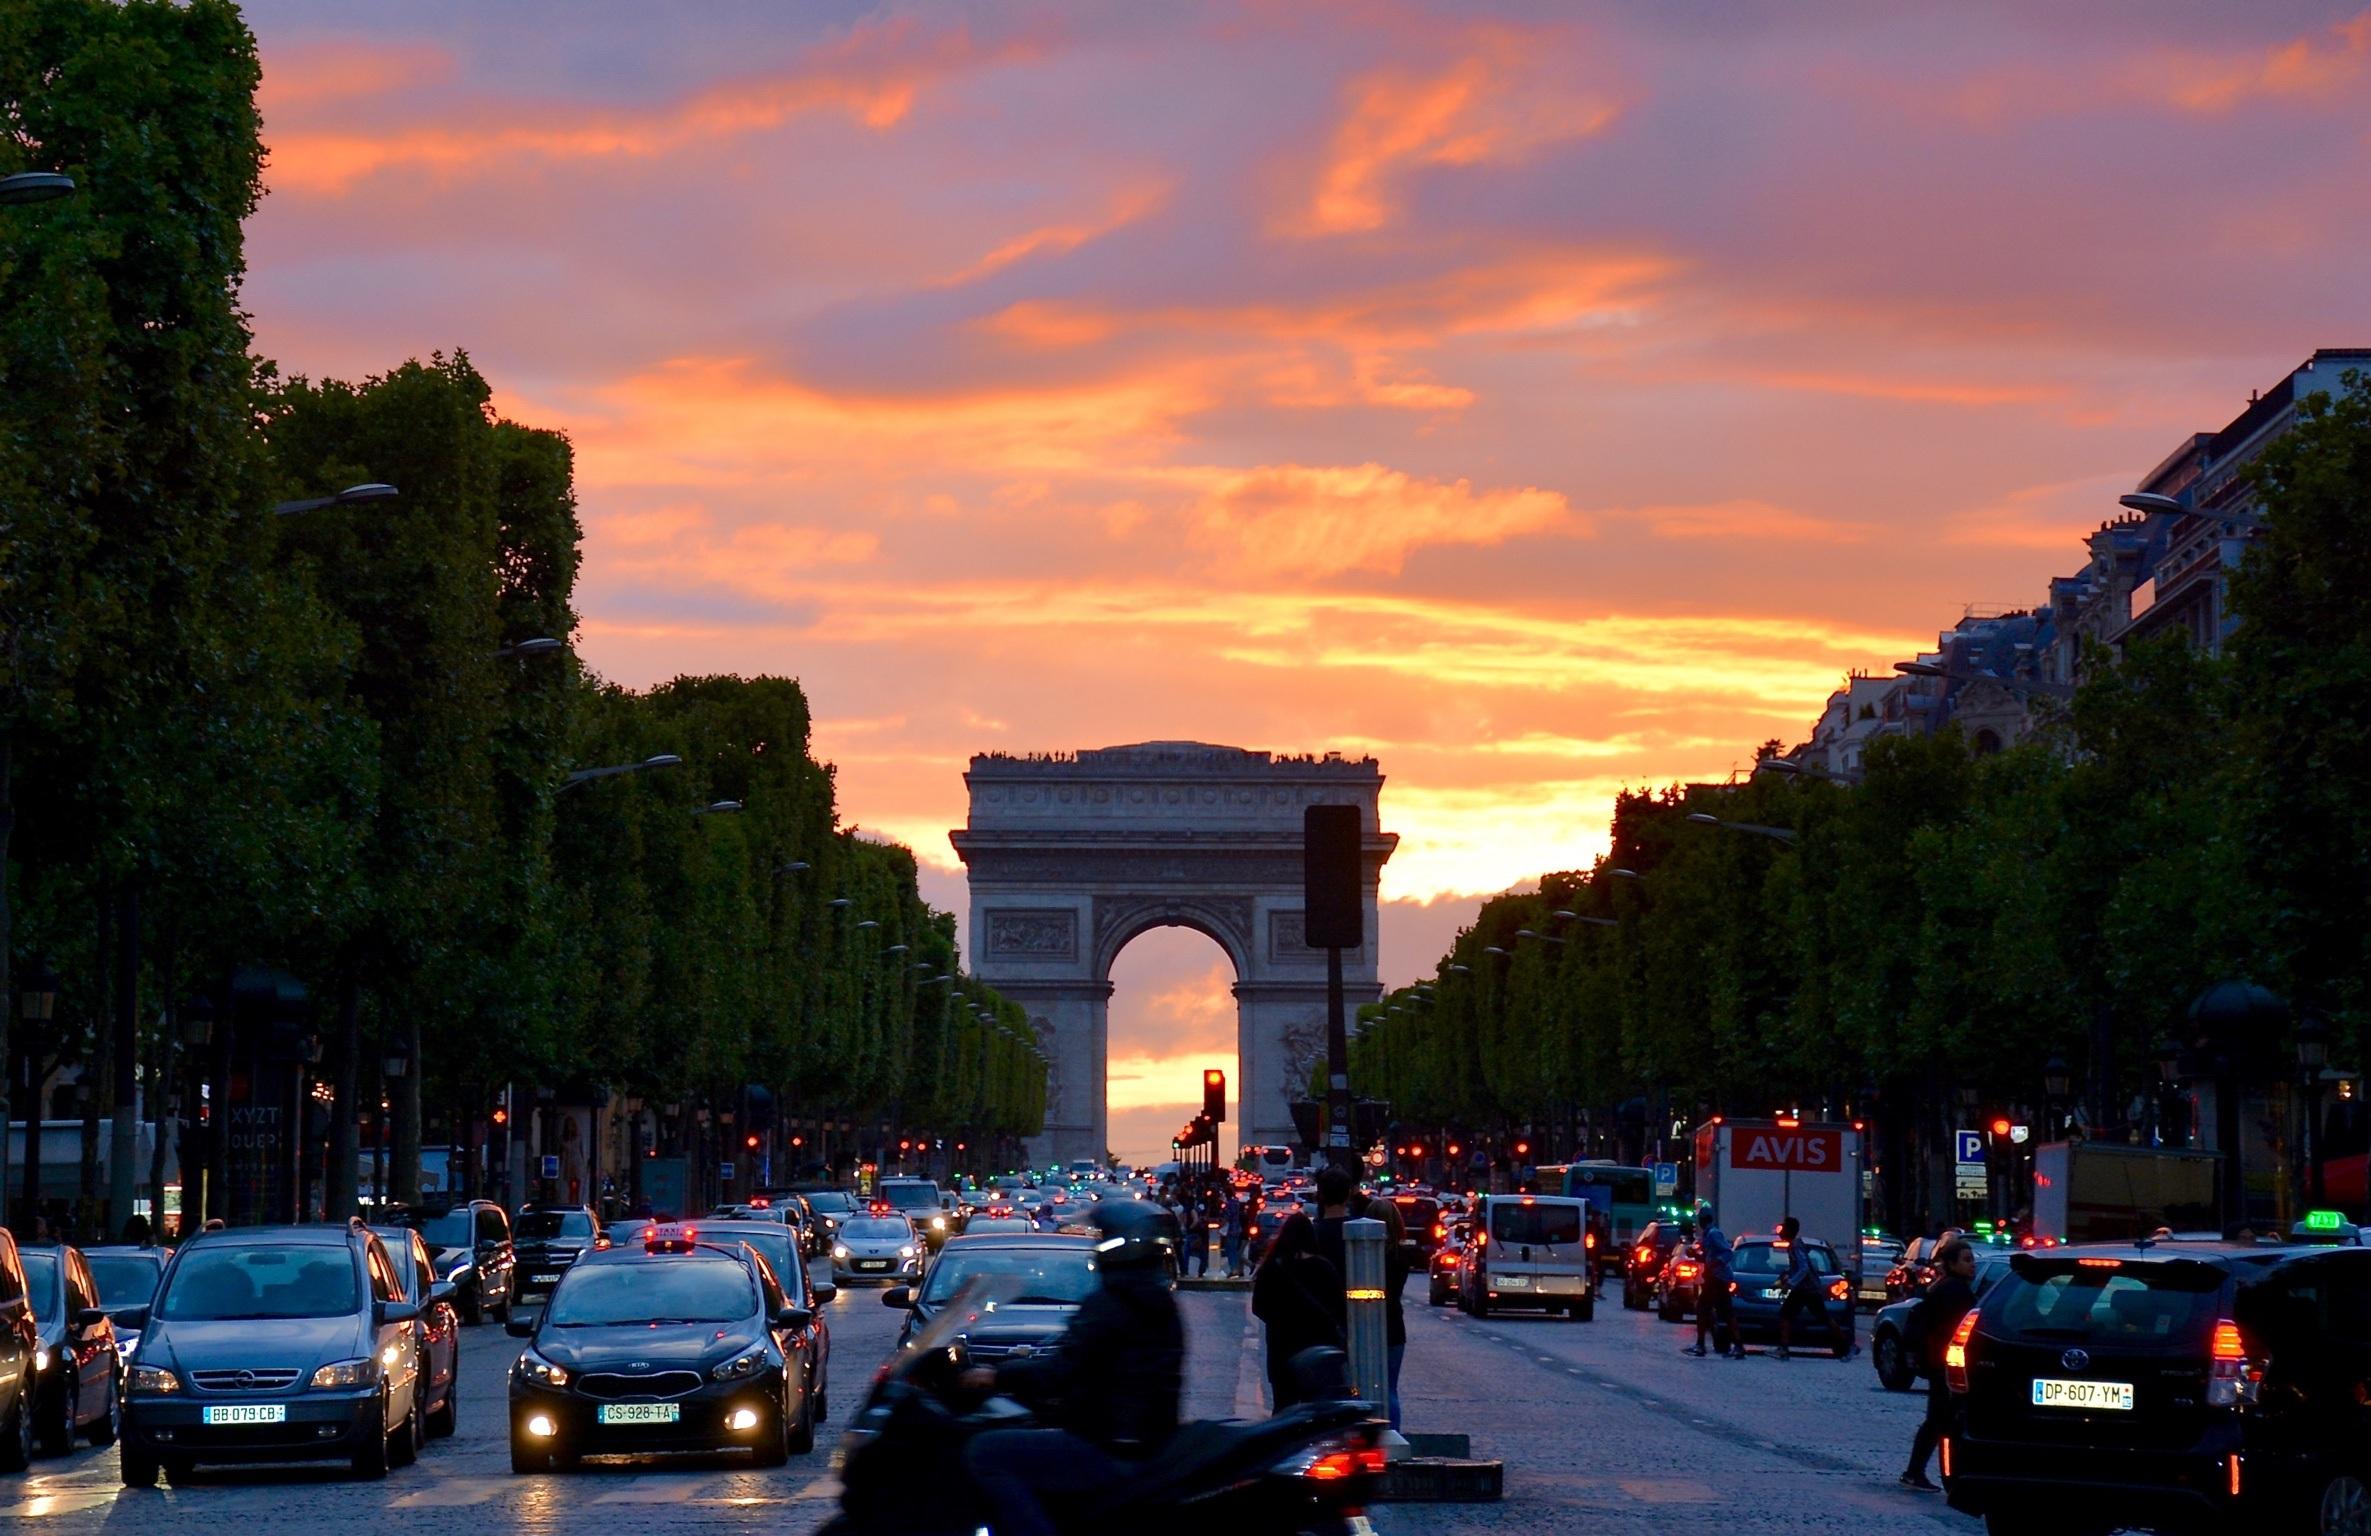 paris-sunset-france-monument-161901.jpg